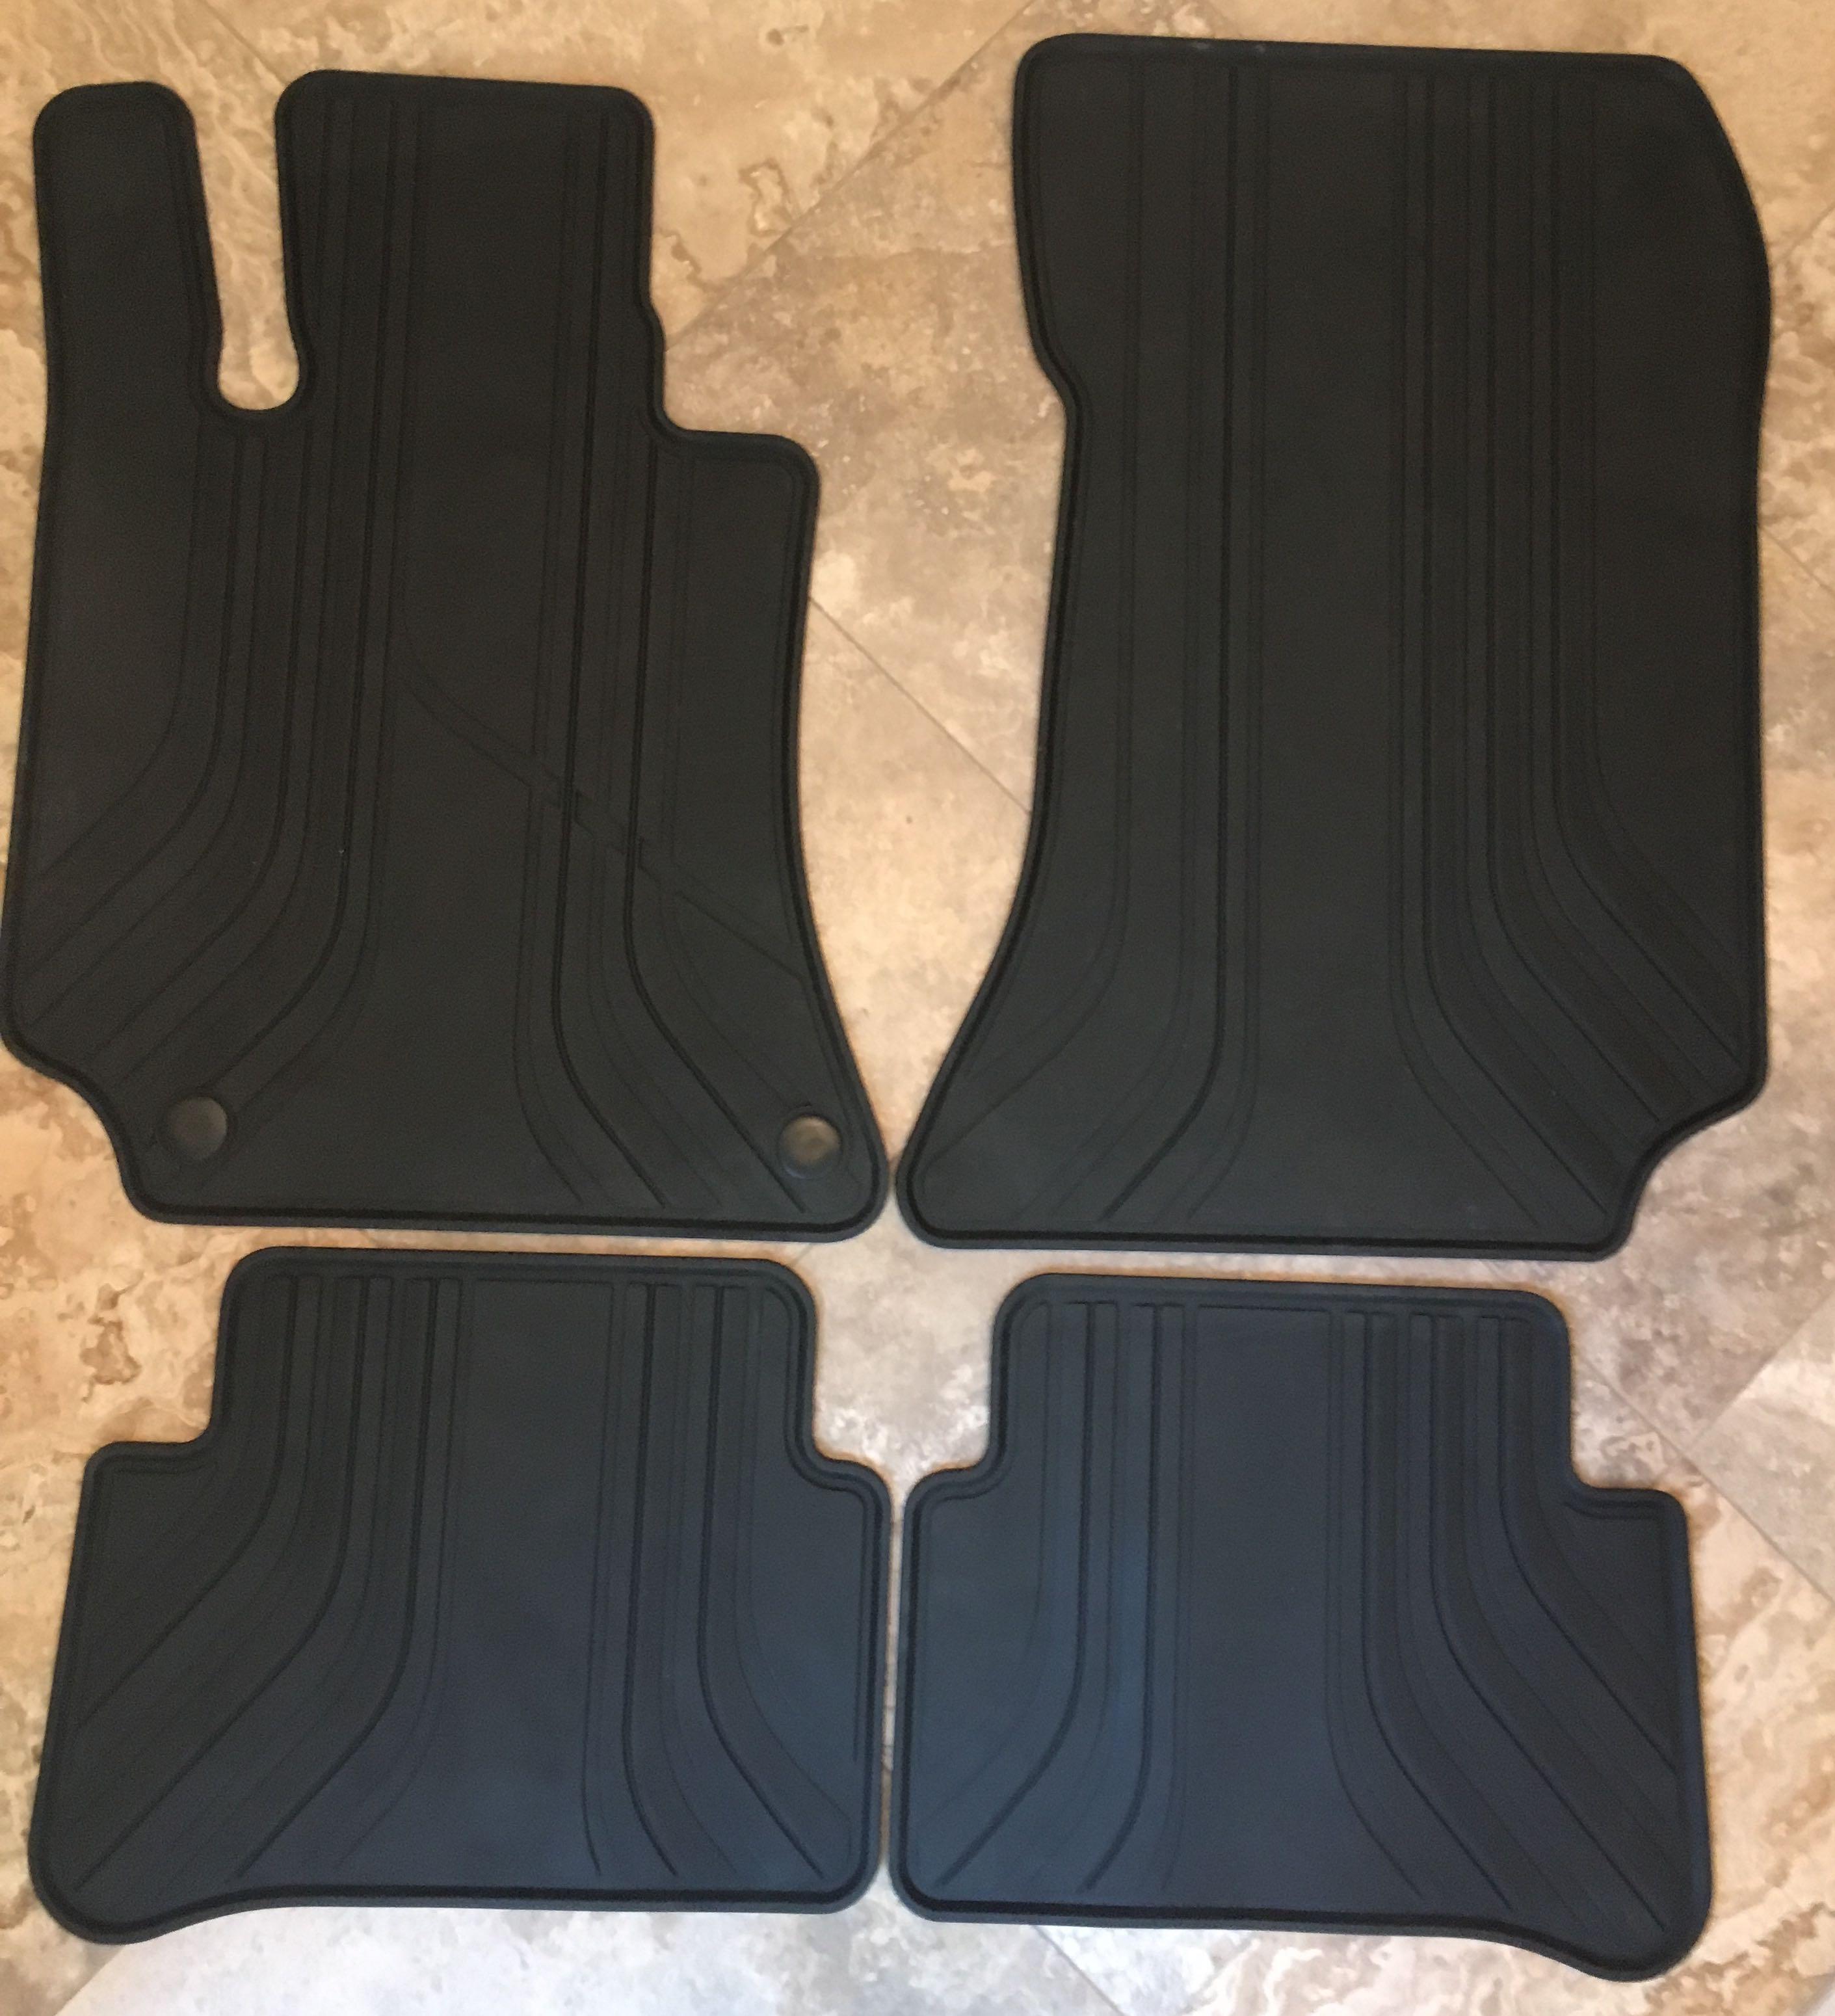 swatch car floor lexus mats seat backing samples tailored with slip covers anti logos binding audi